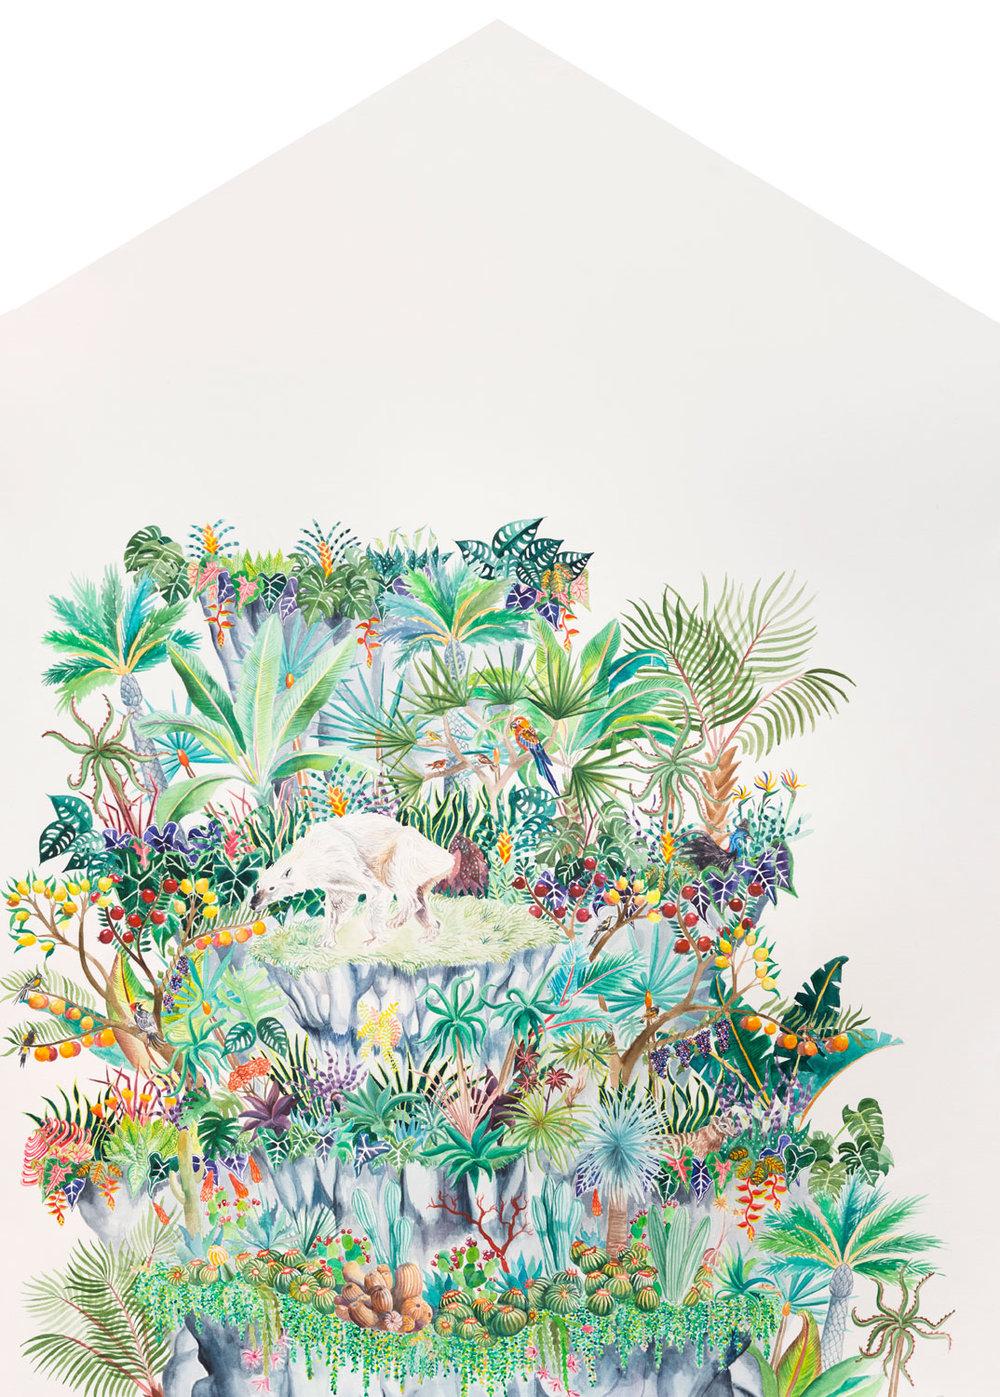 Robin-Crofut-Brittingham-Polarities-Watercolour-on-paper-2018-37-in-x-27-in.jpg